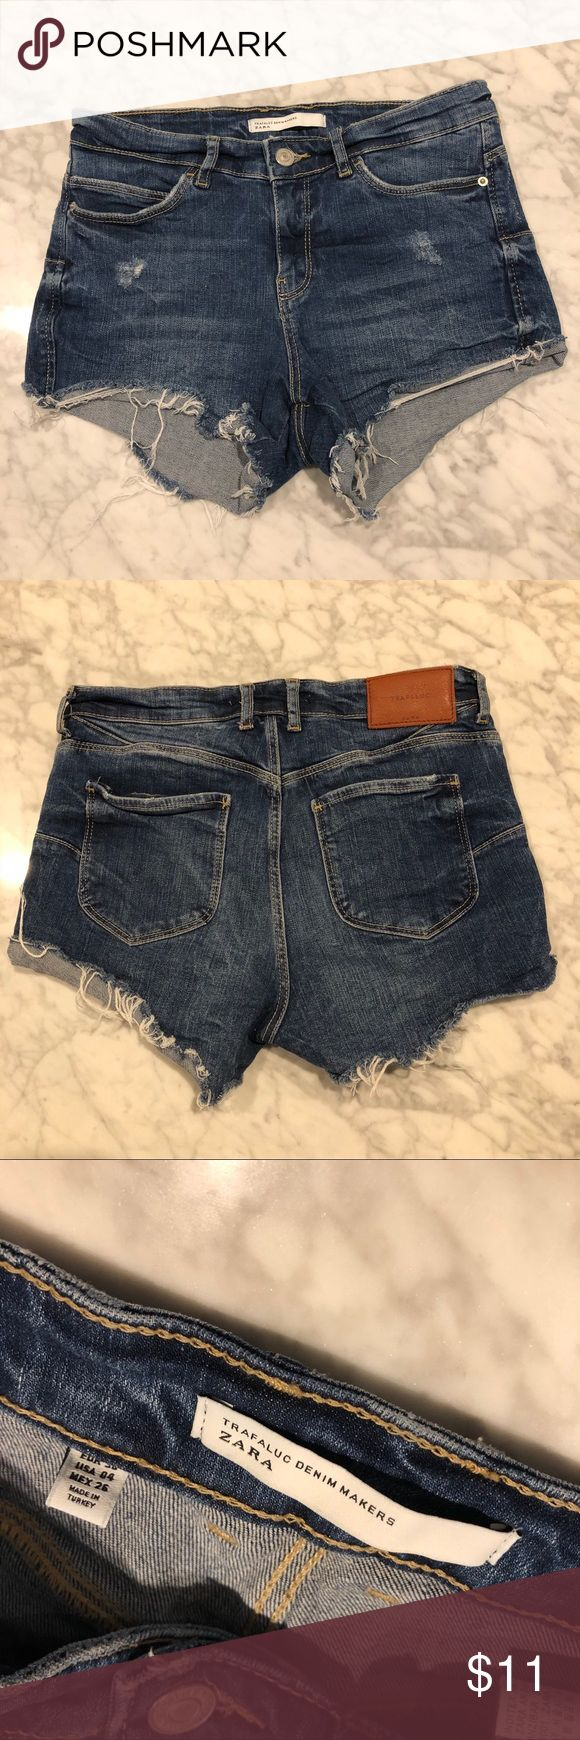 Zara Distressed Jean Shorts Sz 4 EUC Distressed Jean Shorts - 5 pocket style - Trafaluc line at Zara - Size 4  SHOPPING: Within 24 hours Zara Shorts Jean Shorts